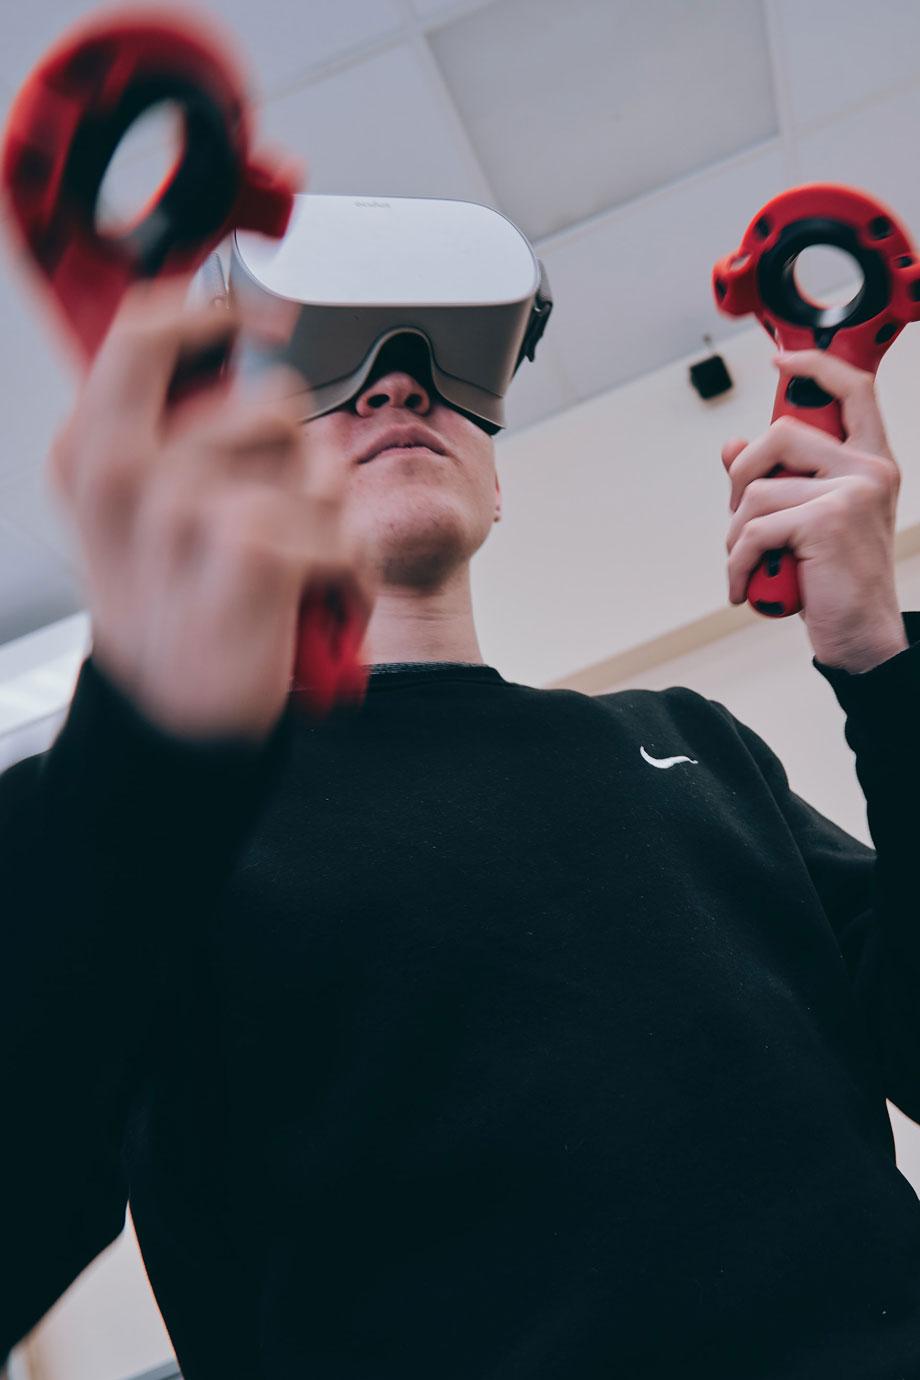 playing games as virtual training